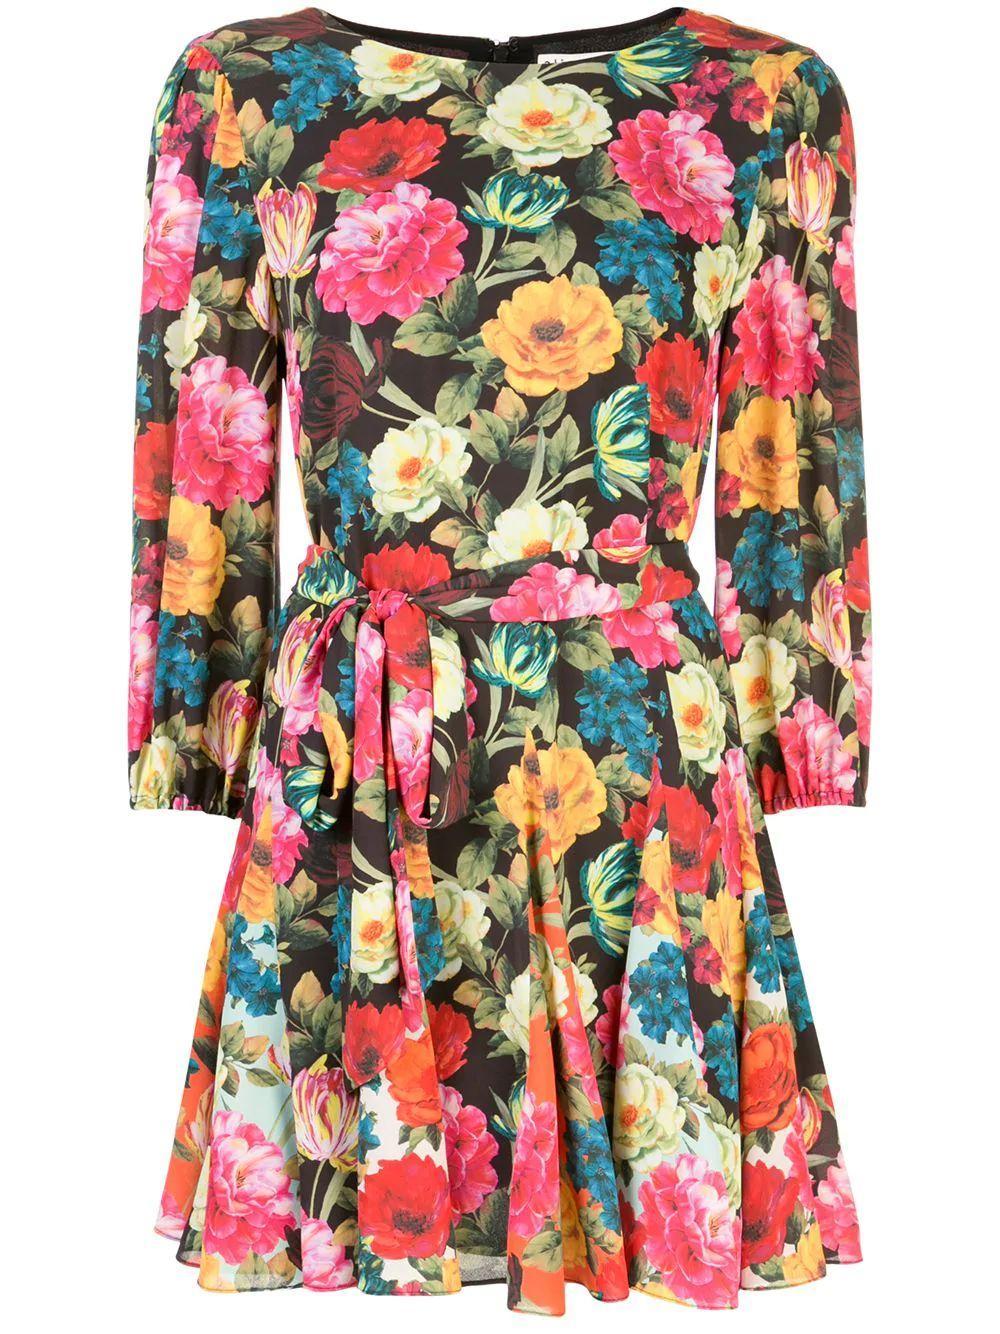 Mina Puff Sleeve Dress With Tie Belt Item # CC002P91538